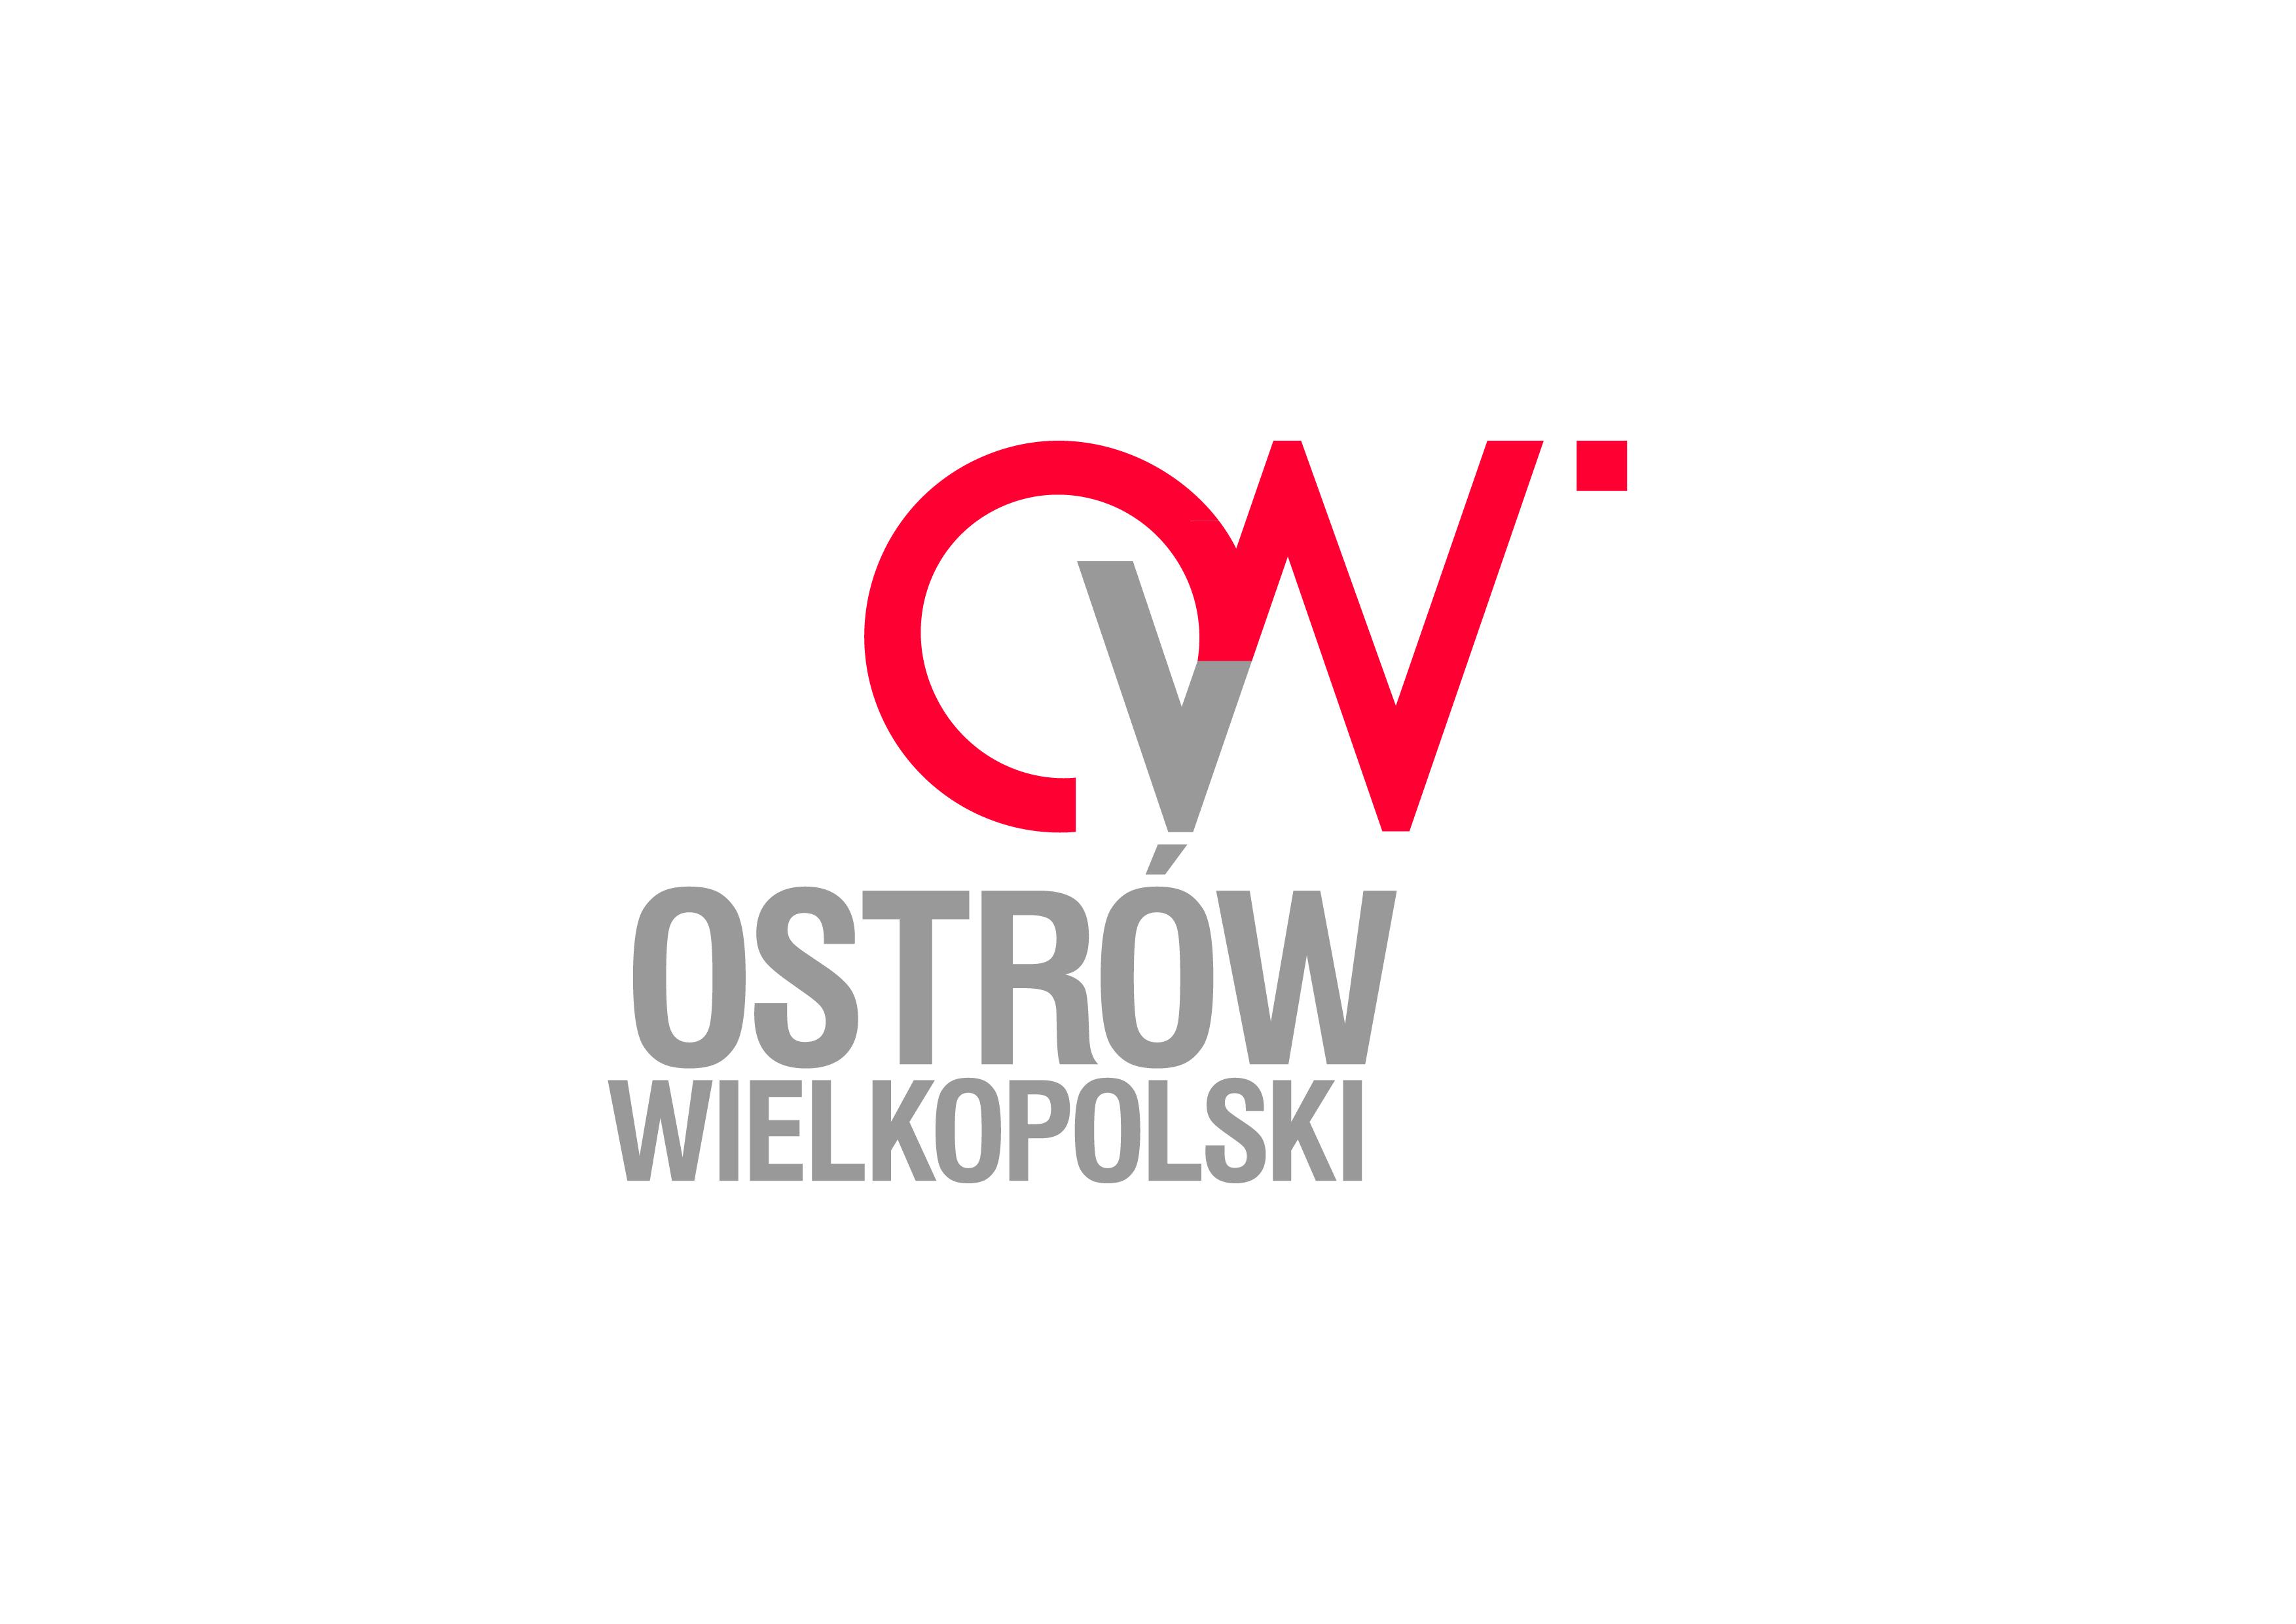 Miasto Ostrów WLKP